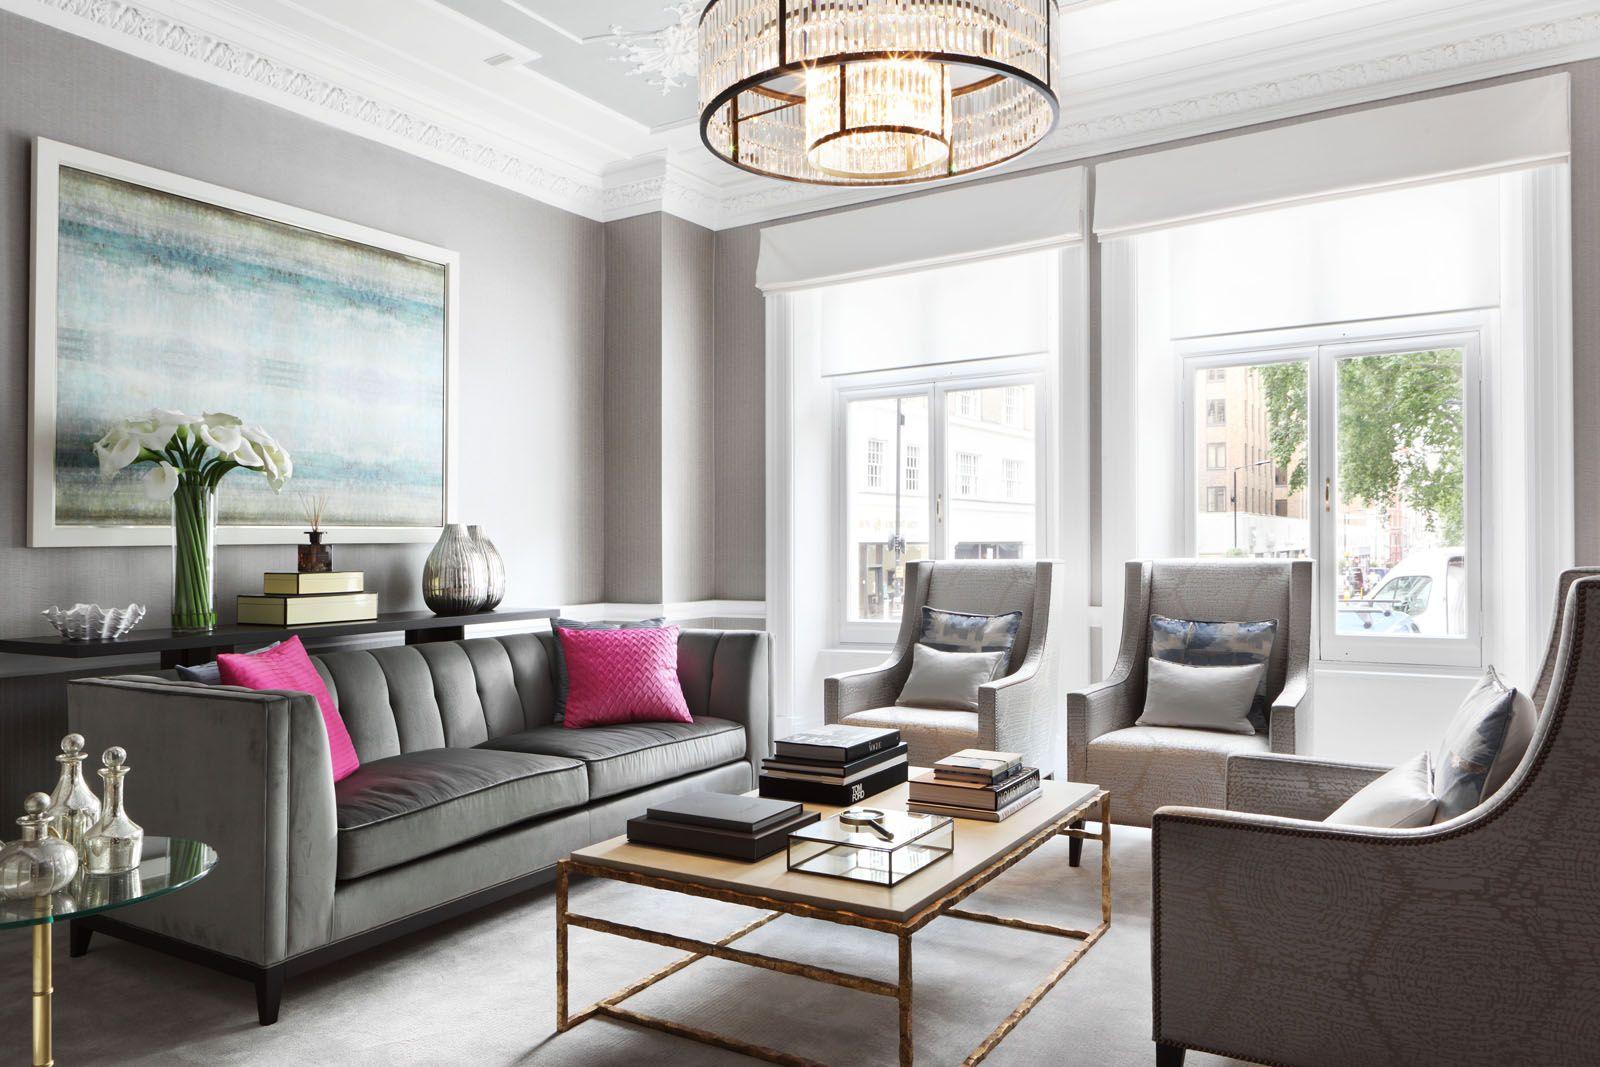 Living Room Design Uk Http Wwwtaylorhowescouk Portfolio Berkeley Squareimageid0